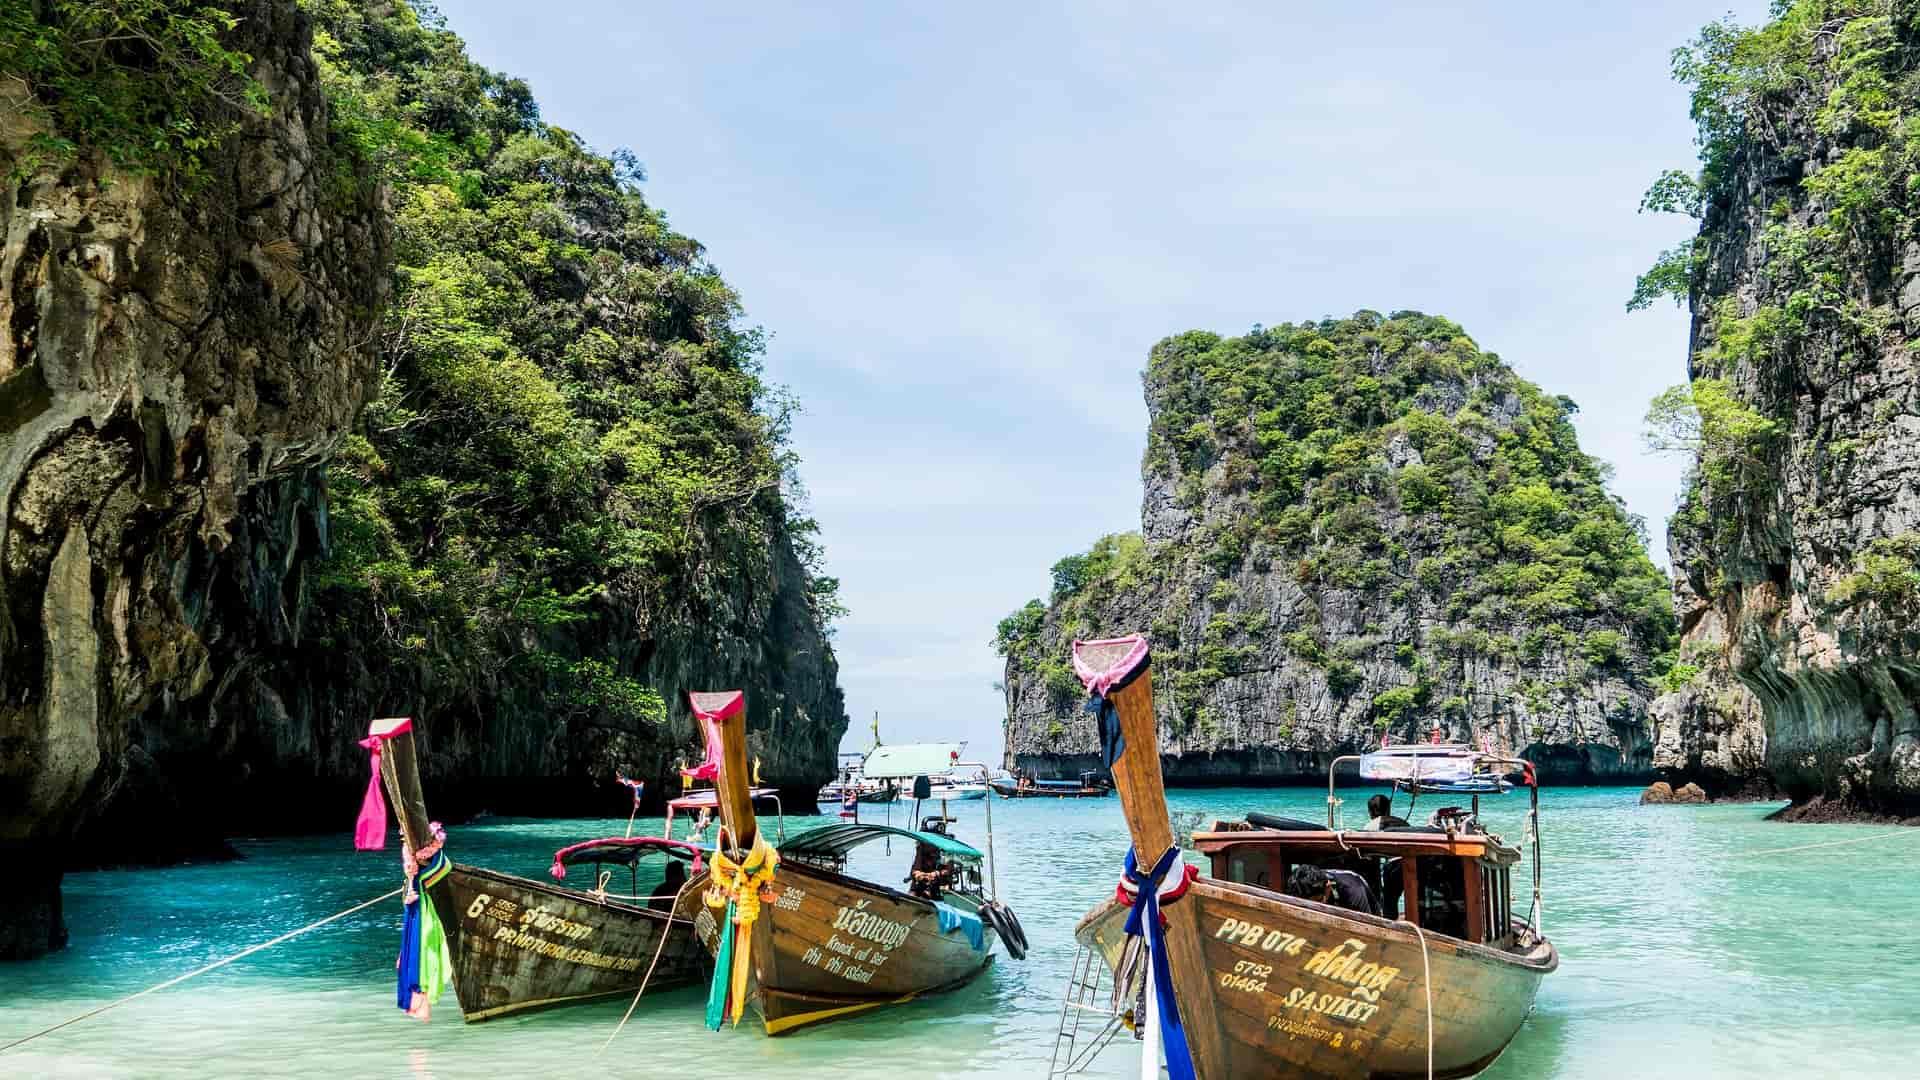 Viaggio di nozze in Thailandia Phuket